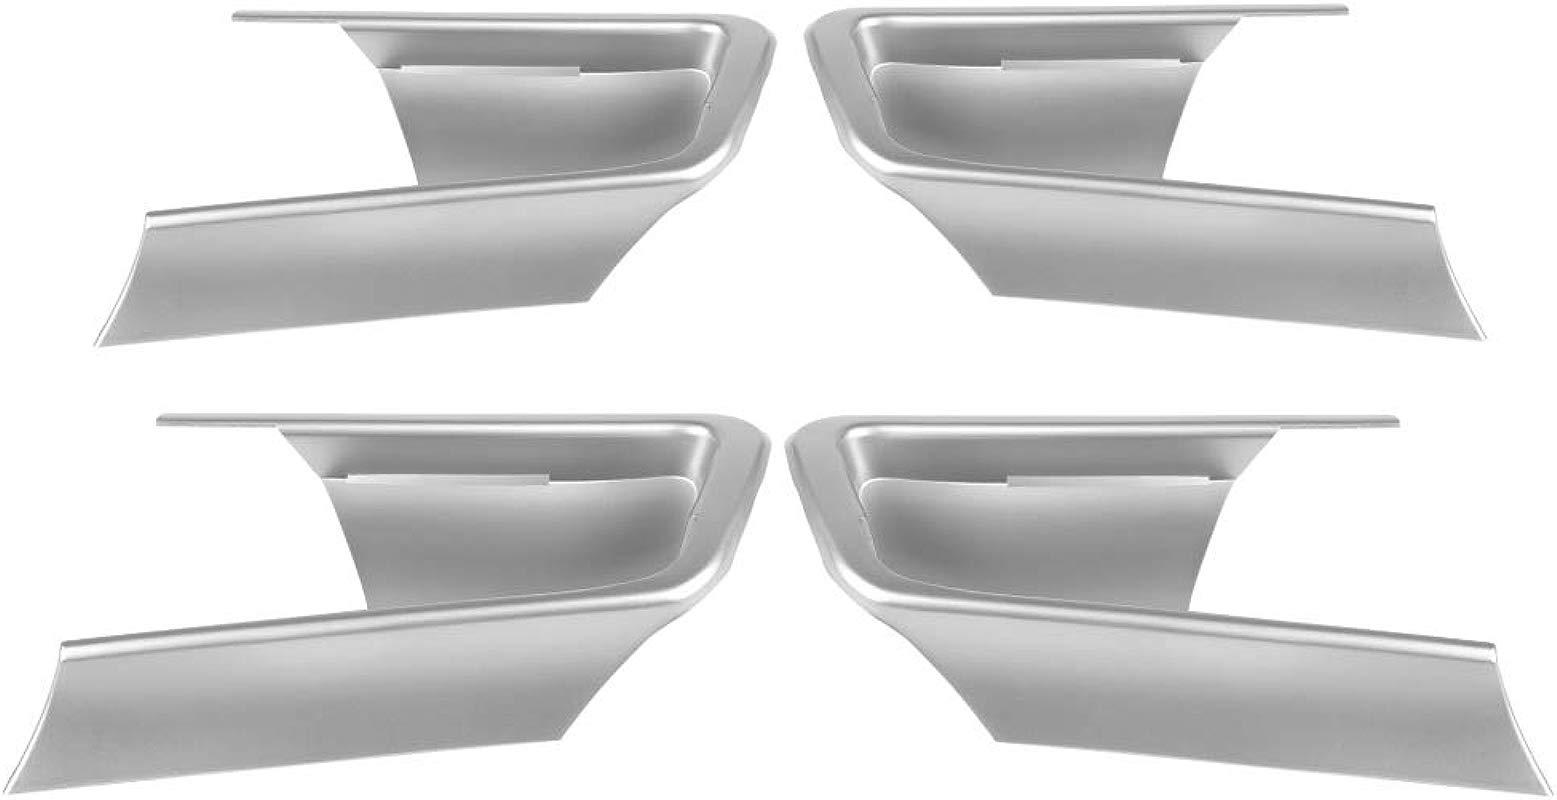 Yunnyp Car Interior Door Bowl Cover Set 4Pcs Car Chromium Electroplating Door Bowl Cover Trim For J150 14 18